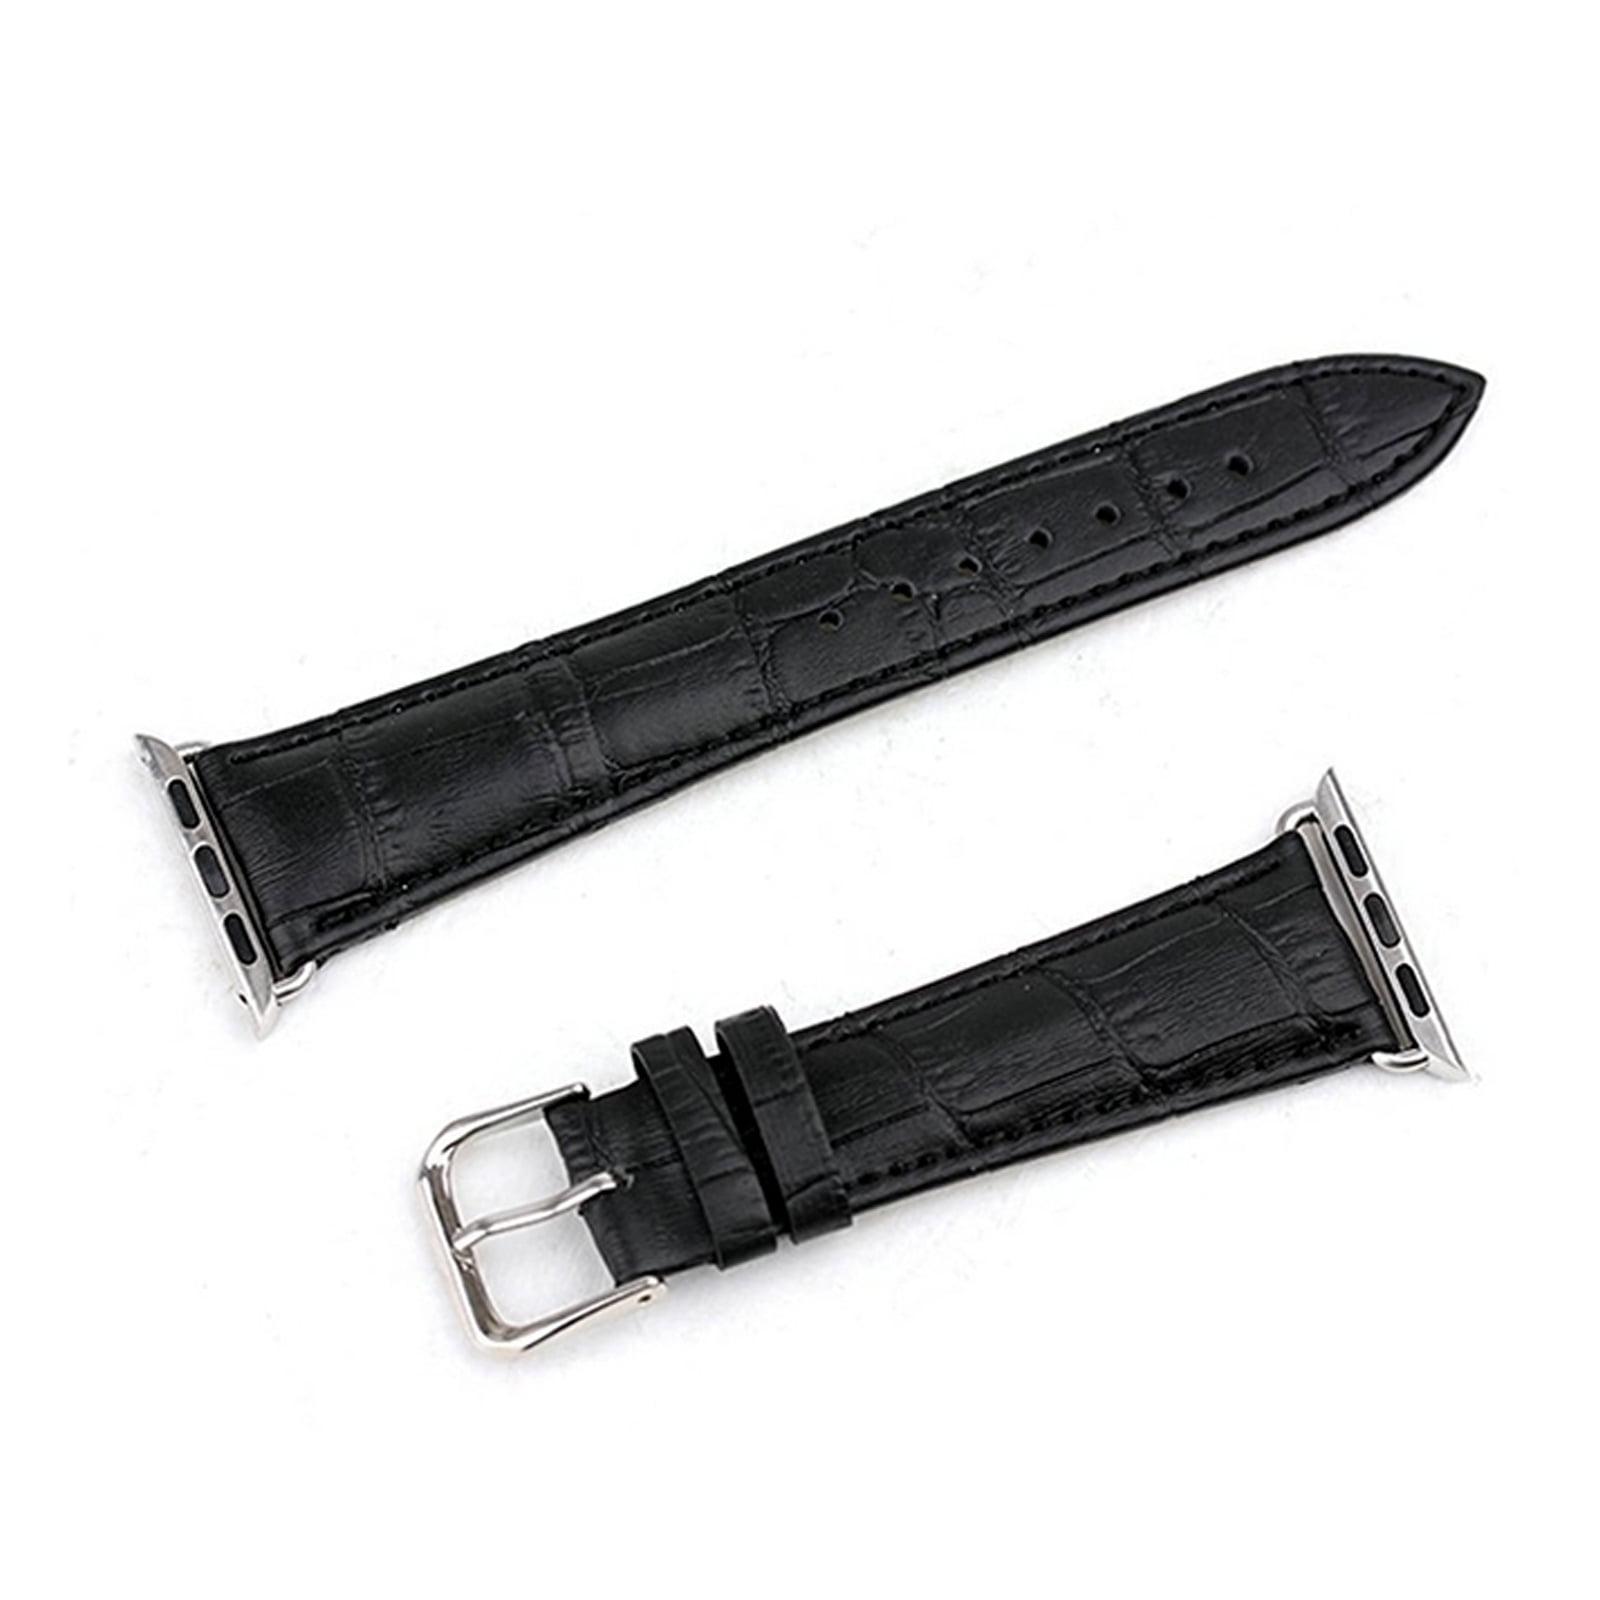 Mgear Wrist Strap For Apple Watch 42mm -  Black